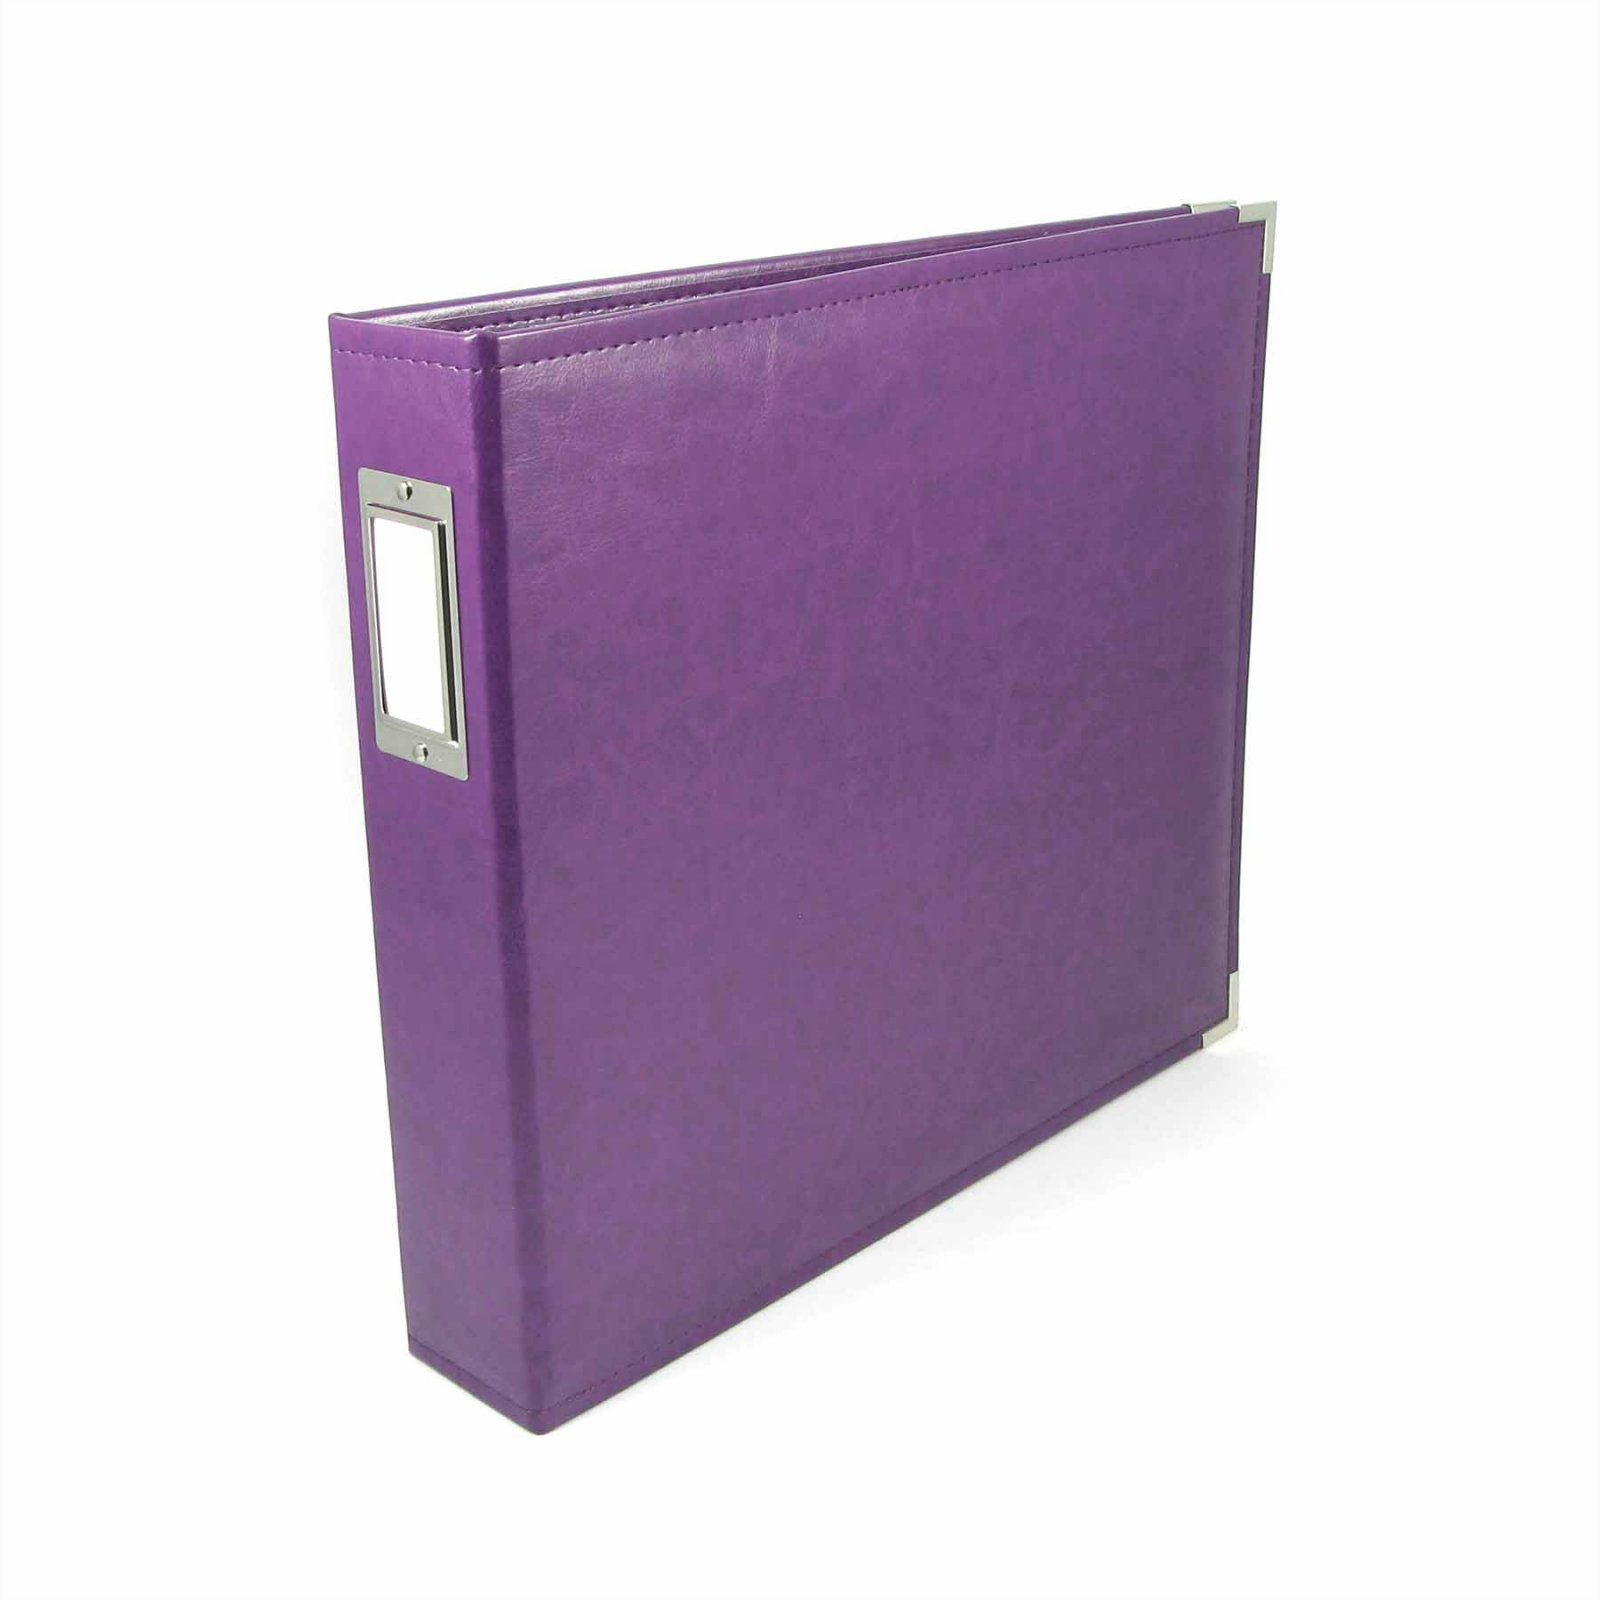 We R Memory Keepers 12x12 Album-Grape Soda